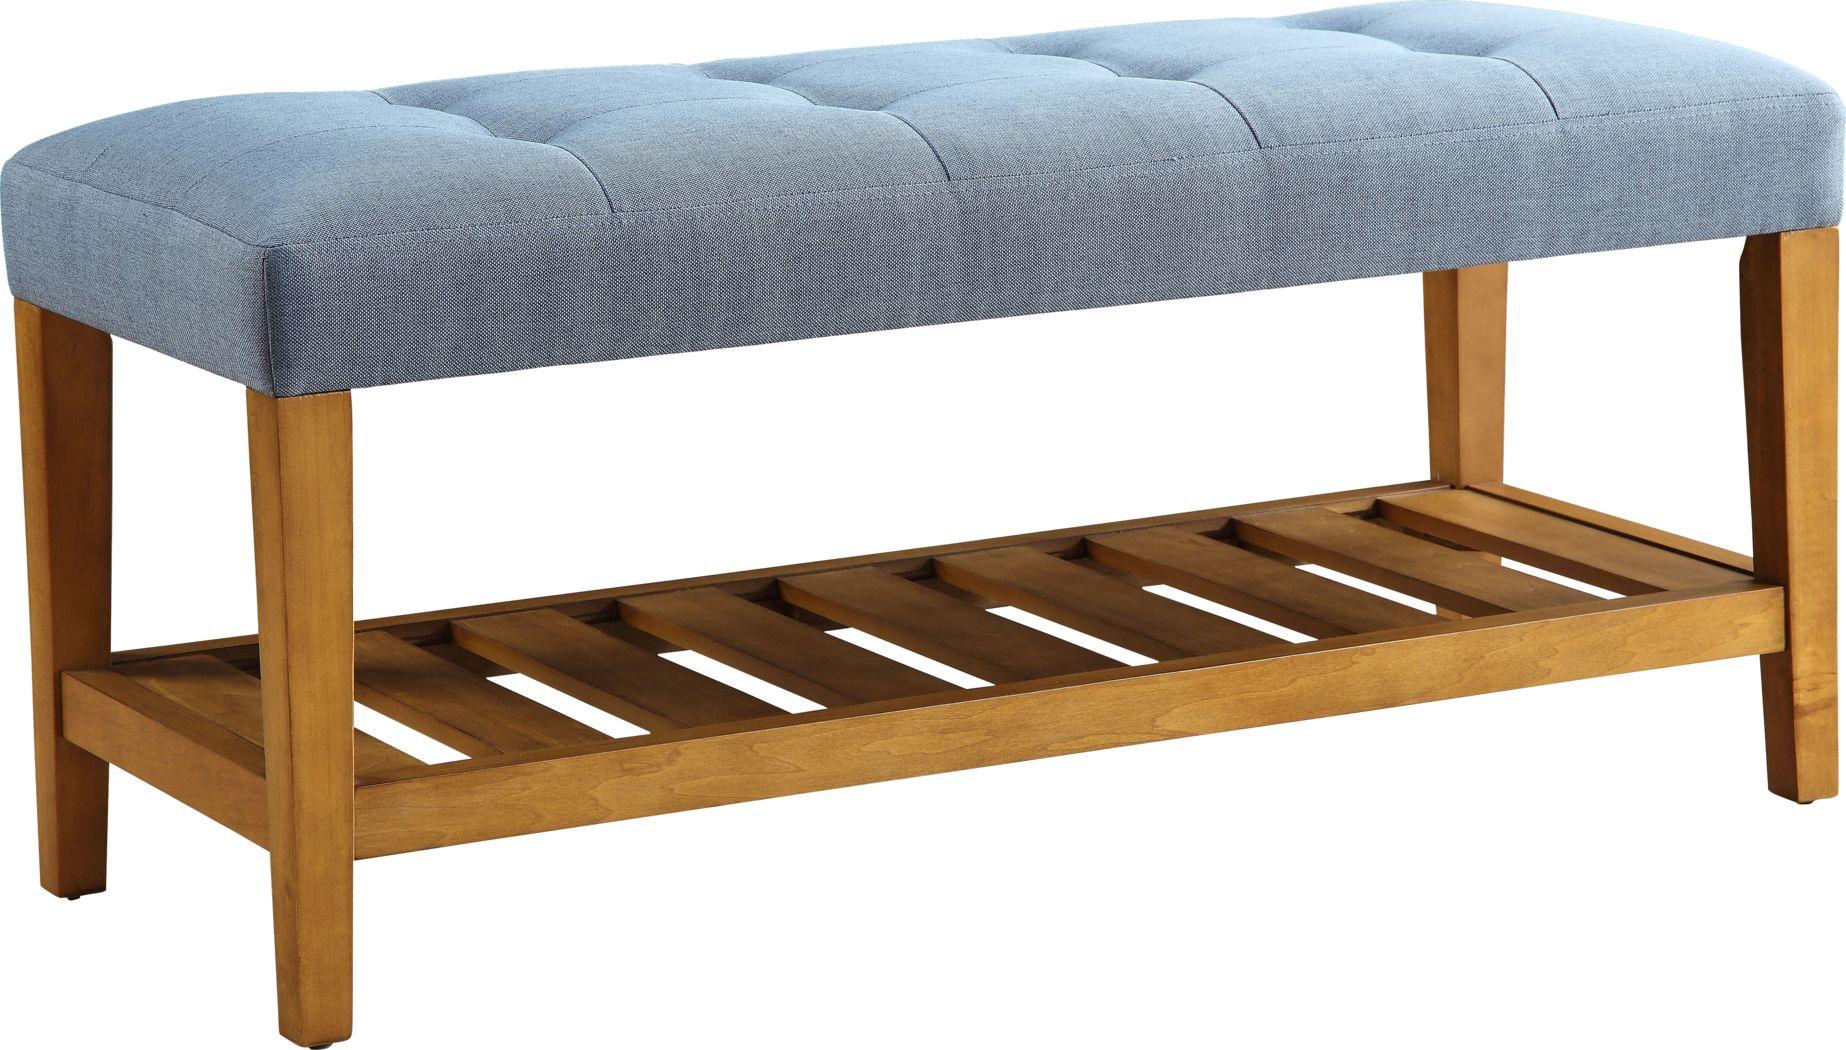 Cacia Blue Bench